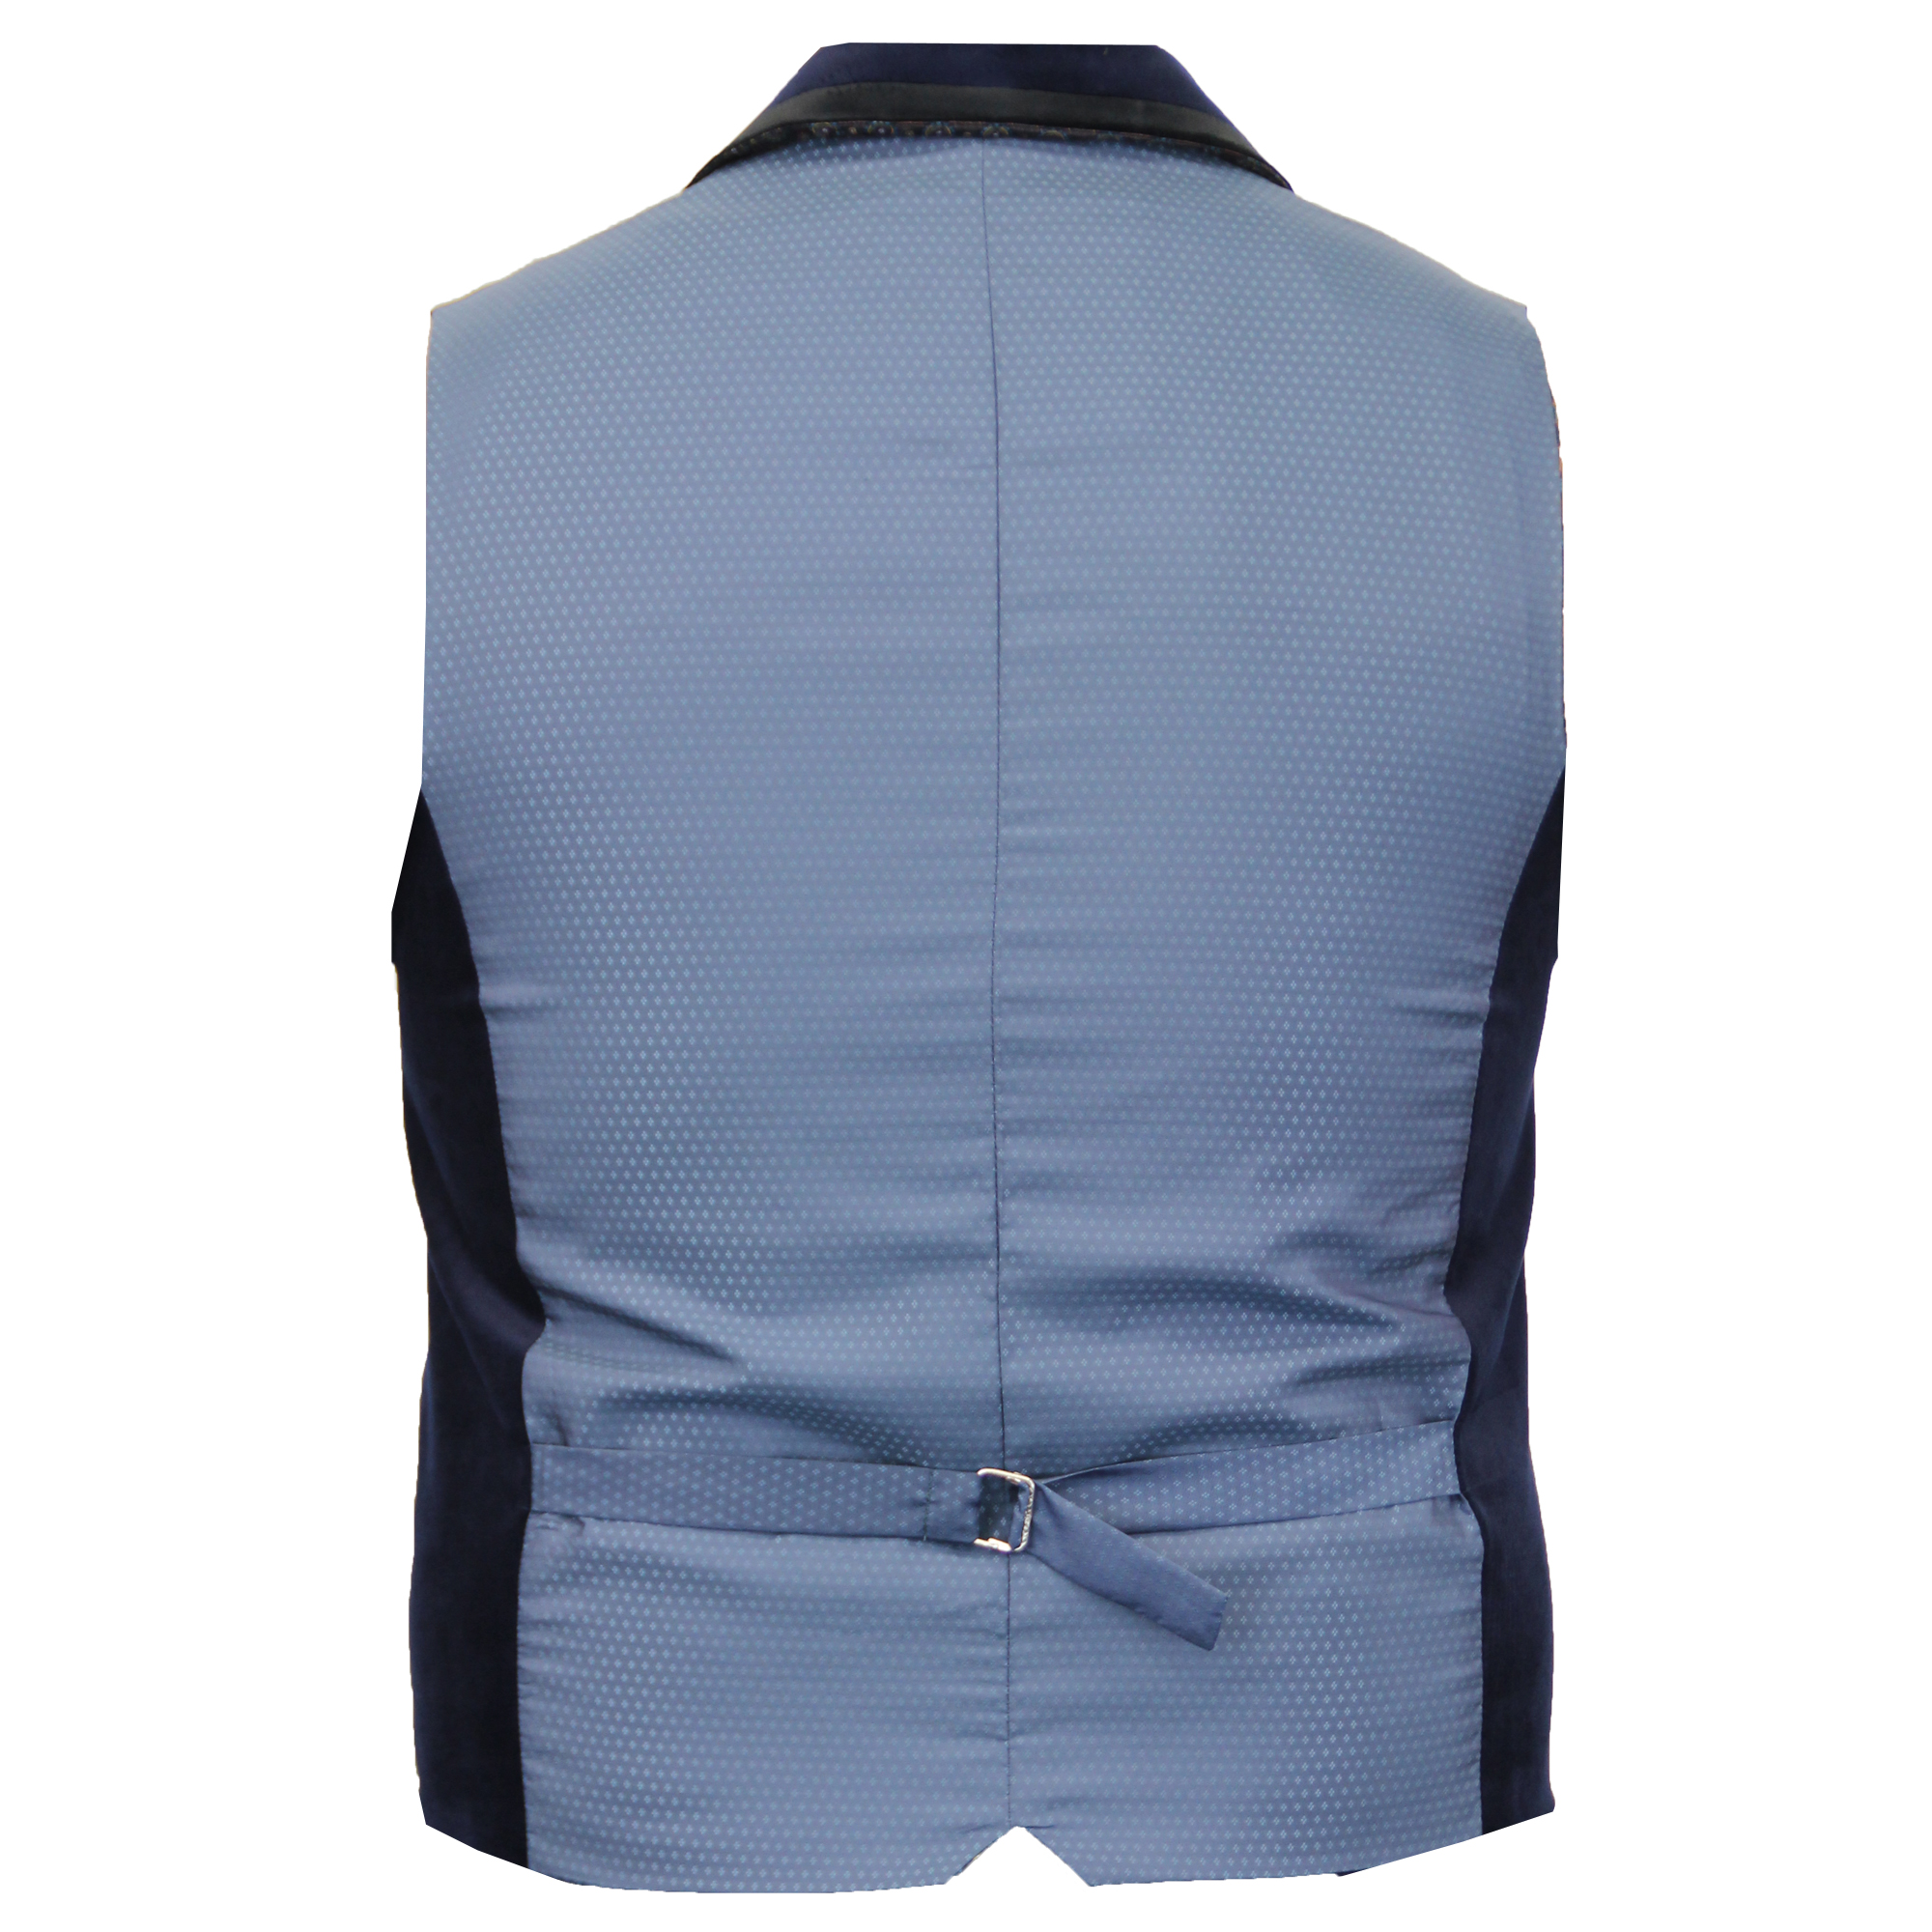 Mens-Waistcoat-Wool-Mix-Cord-Cavani-Formal-Vest-Herringbone-Tweed-Check-Party thumbnail 5